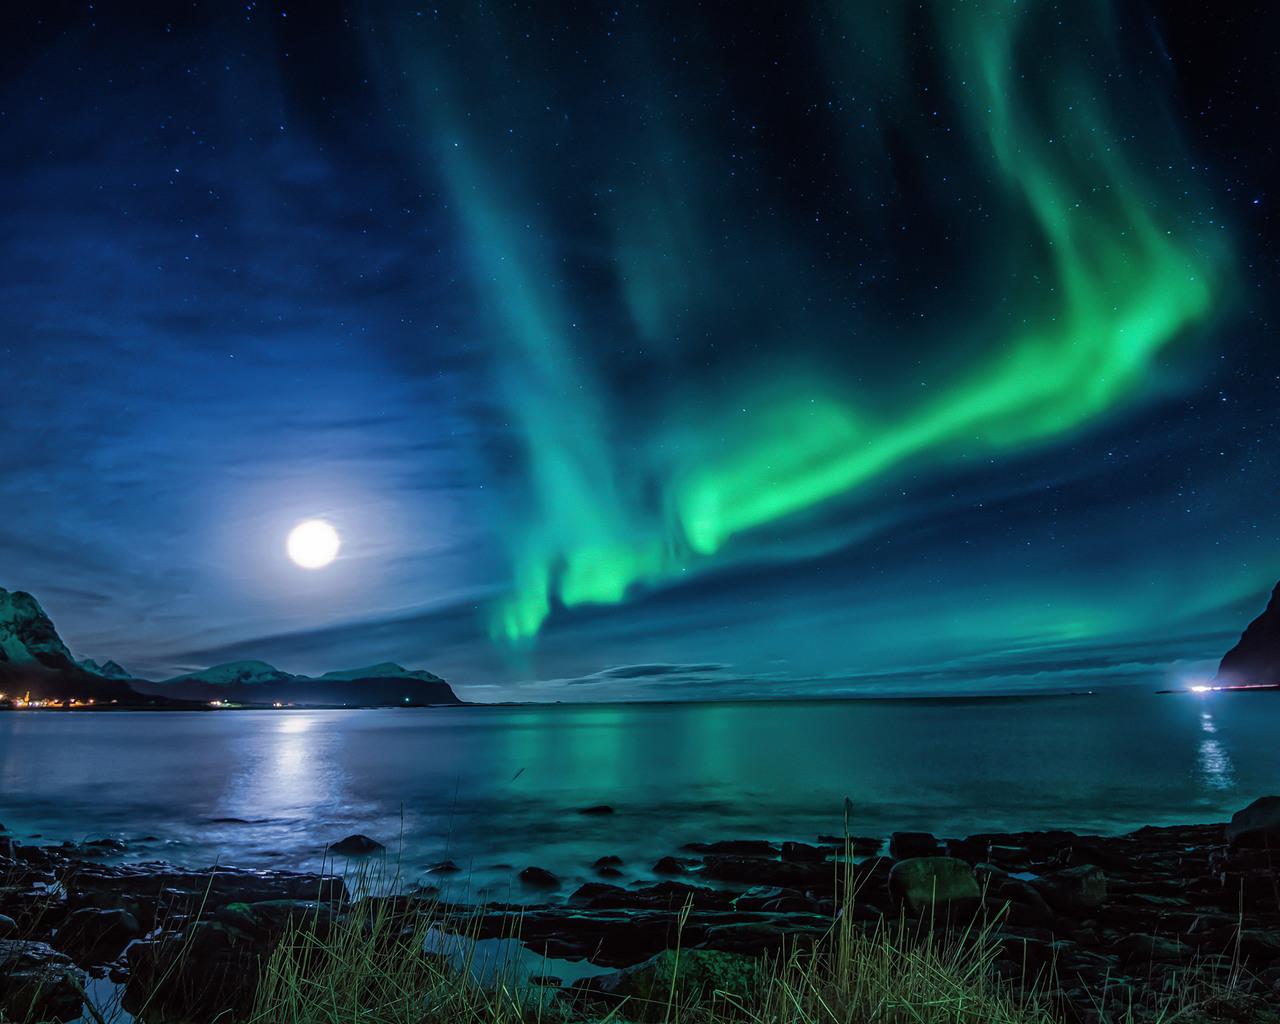 4k Hd Wallapaper: 1280x1024 Aurora Borealis Moon Night 1280x1024 Resolution